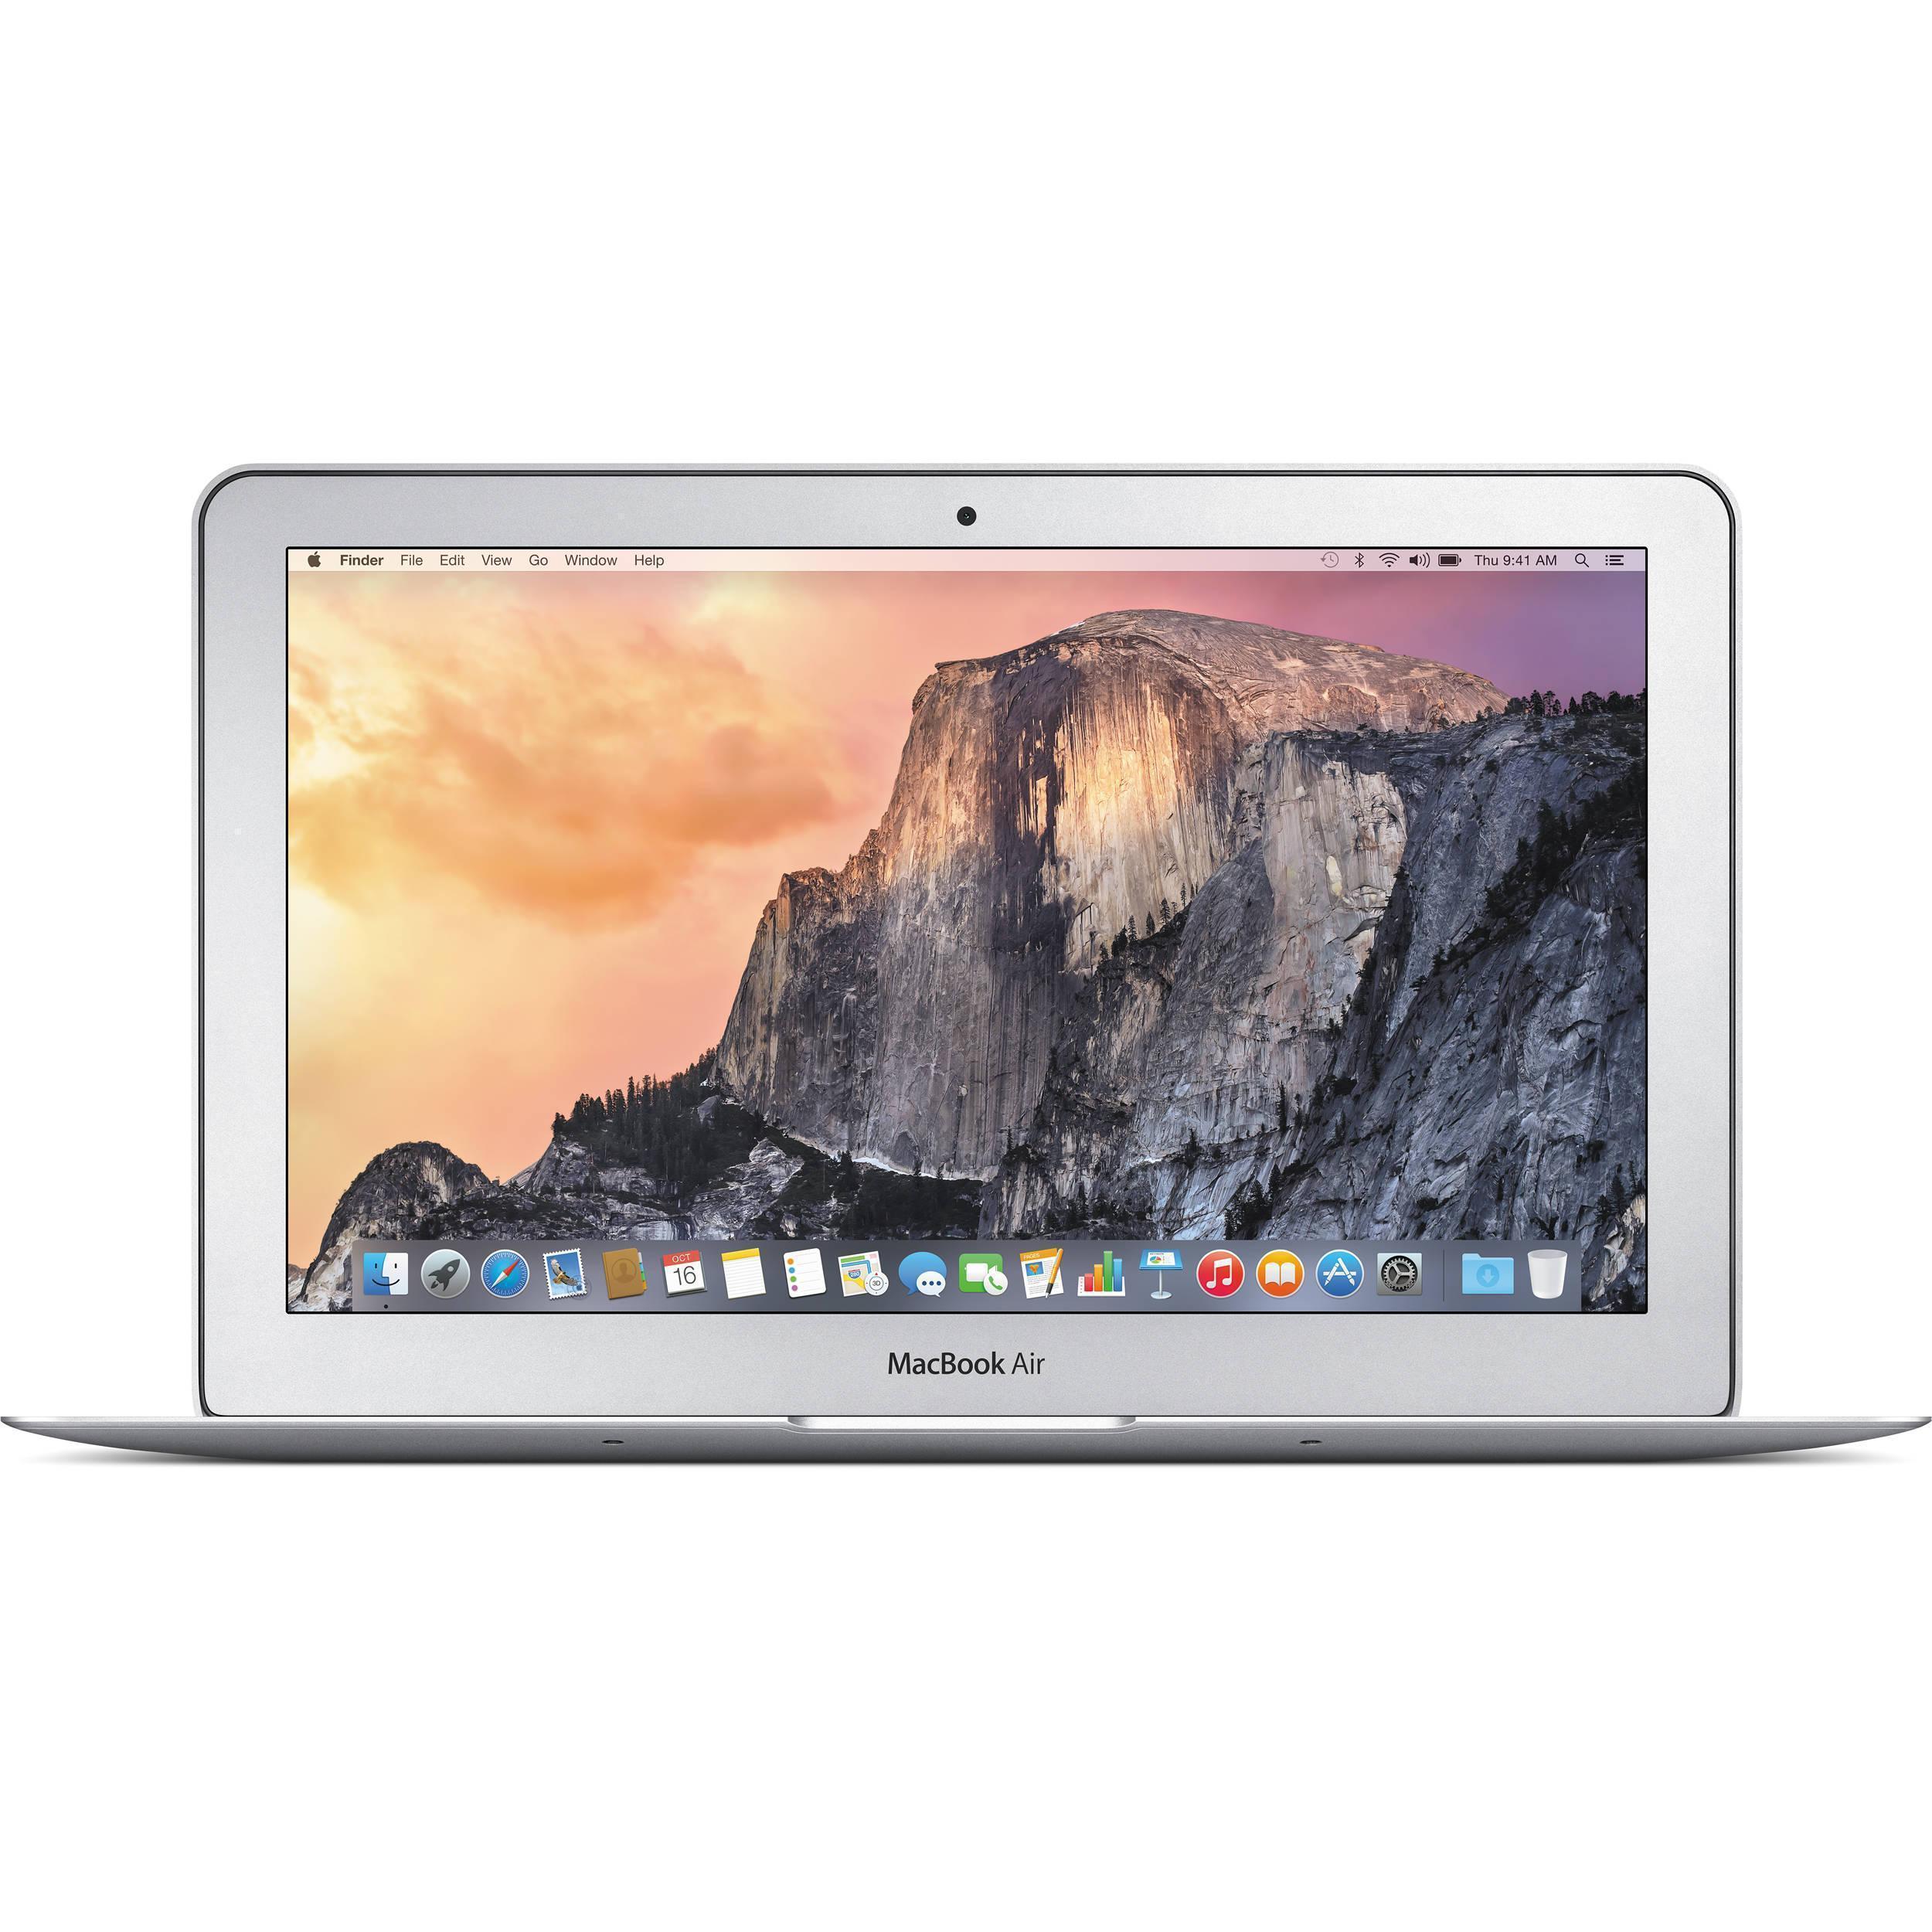 MacBook Air 11,6-tum (2011) - Core i5 - 4GB - SSD 128 GB QWERTY - Engelska (USA)